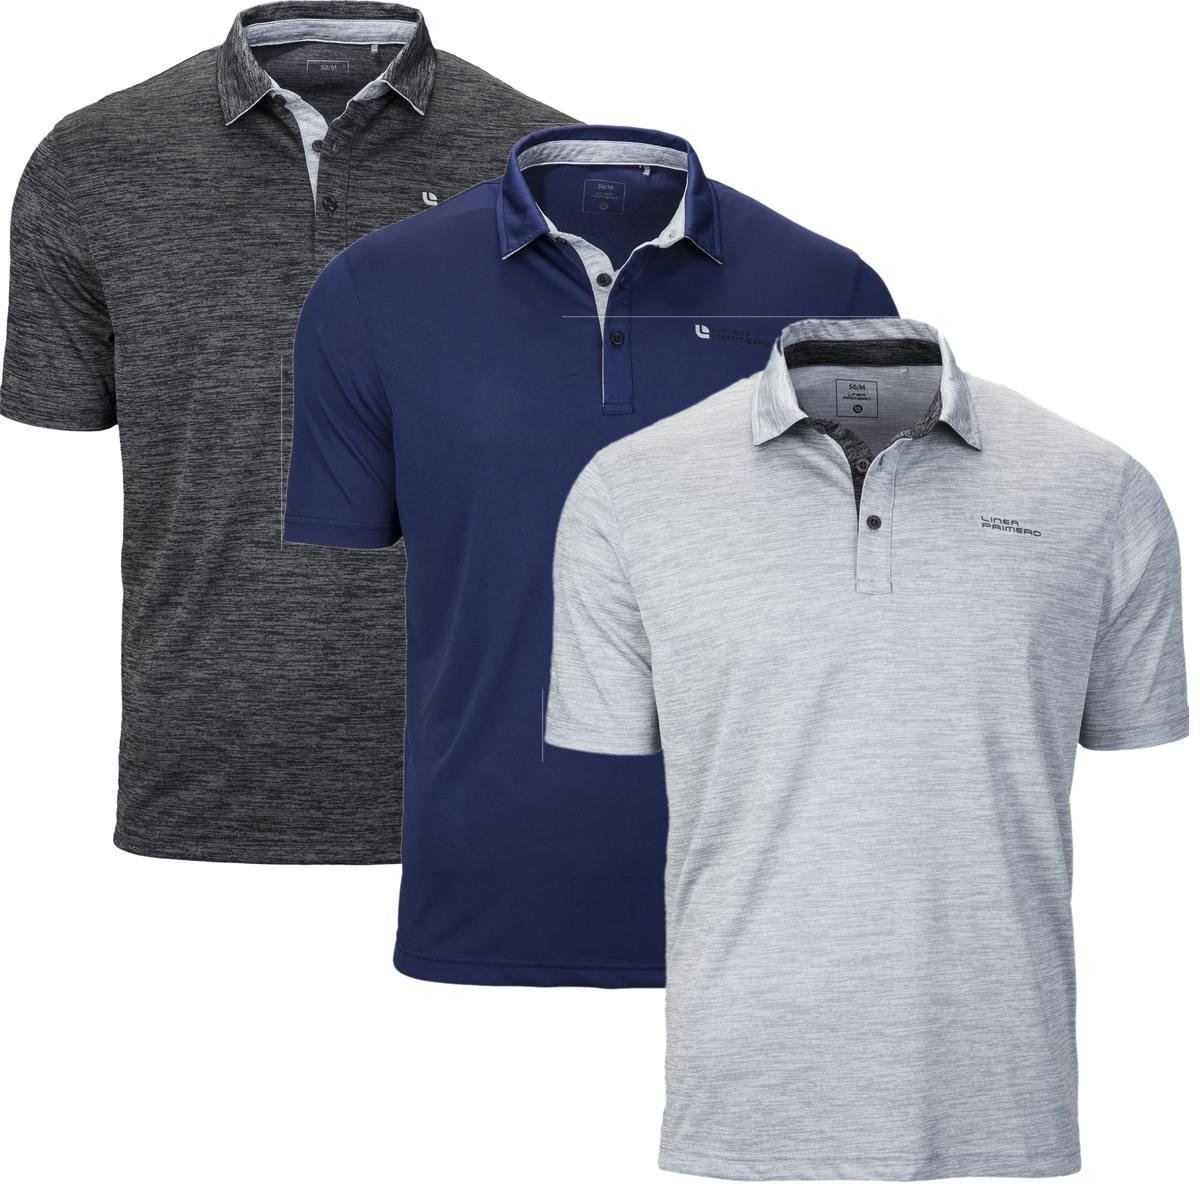 Linea Primero Samson Herren Shirt Funktionspolo Poloshirt